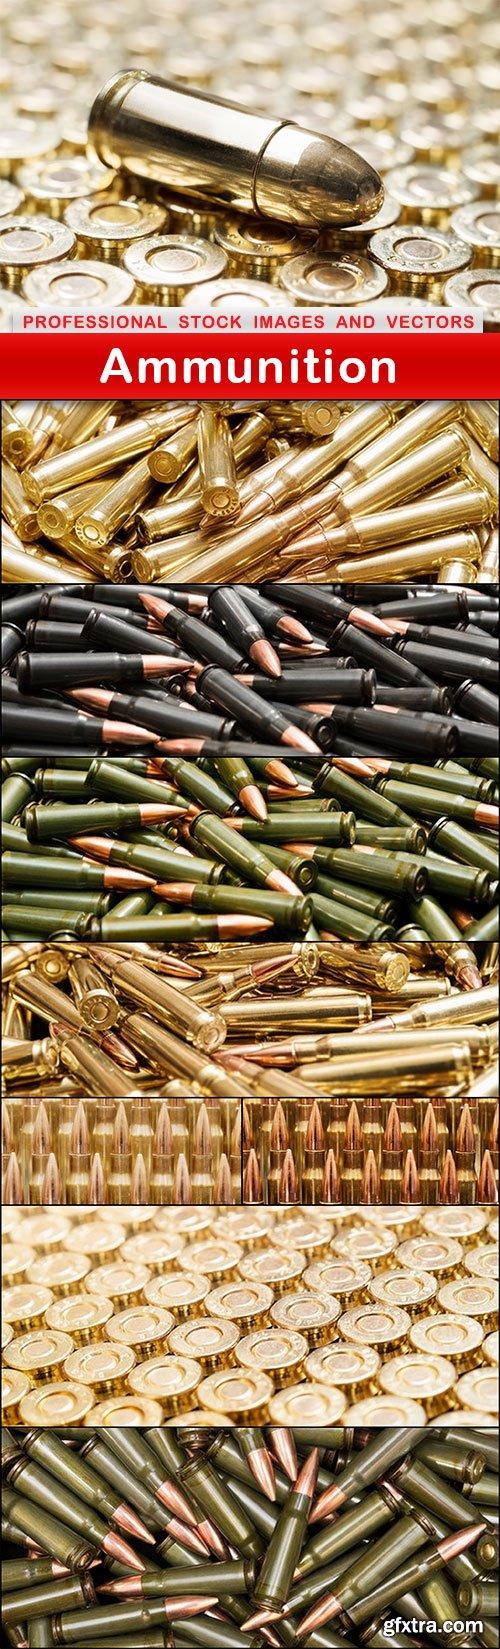 Ammunition - 9 UHQ JPEG